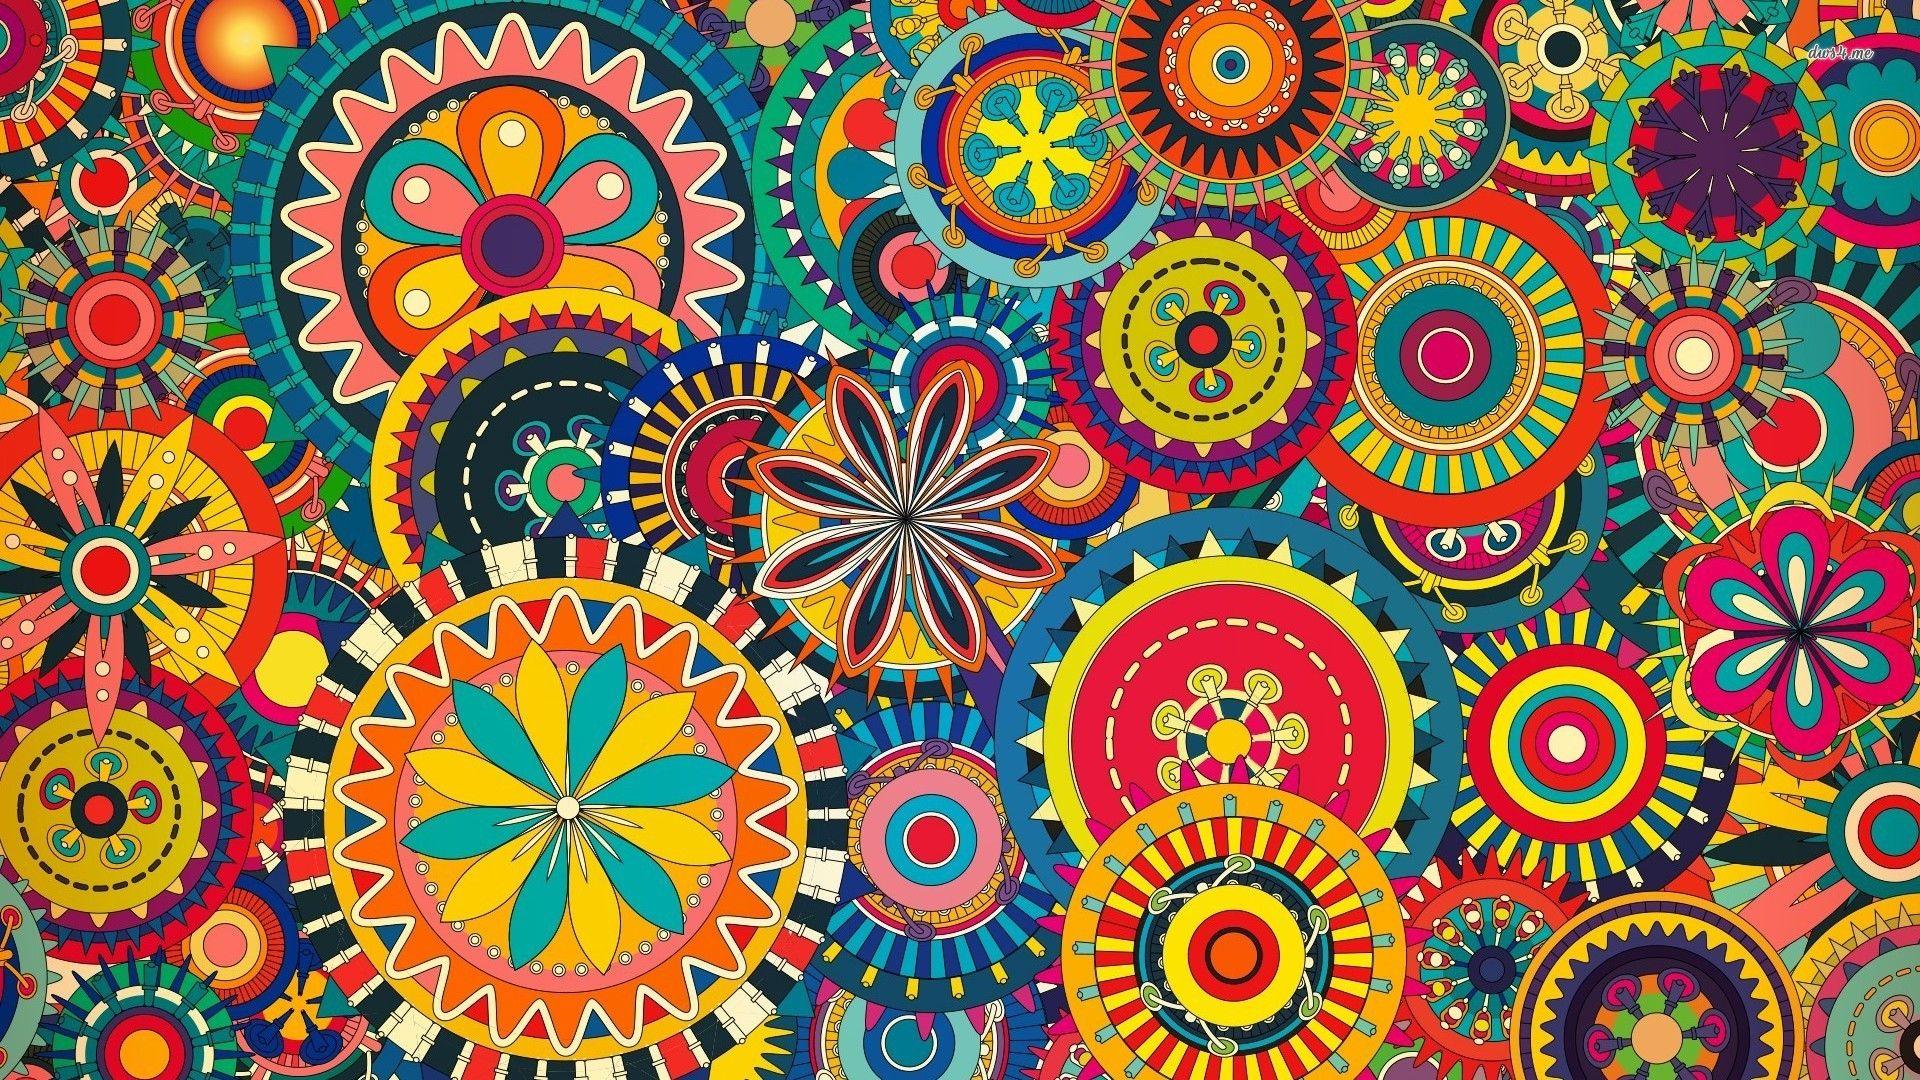 Colorful Patterns Design Inspiration 27631 Decorating